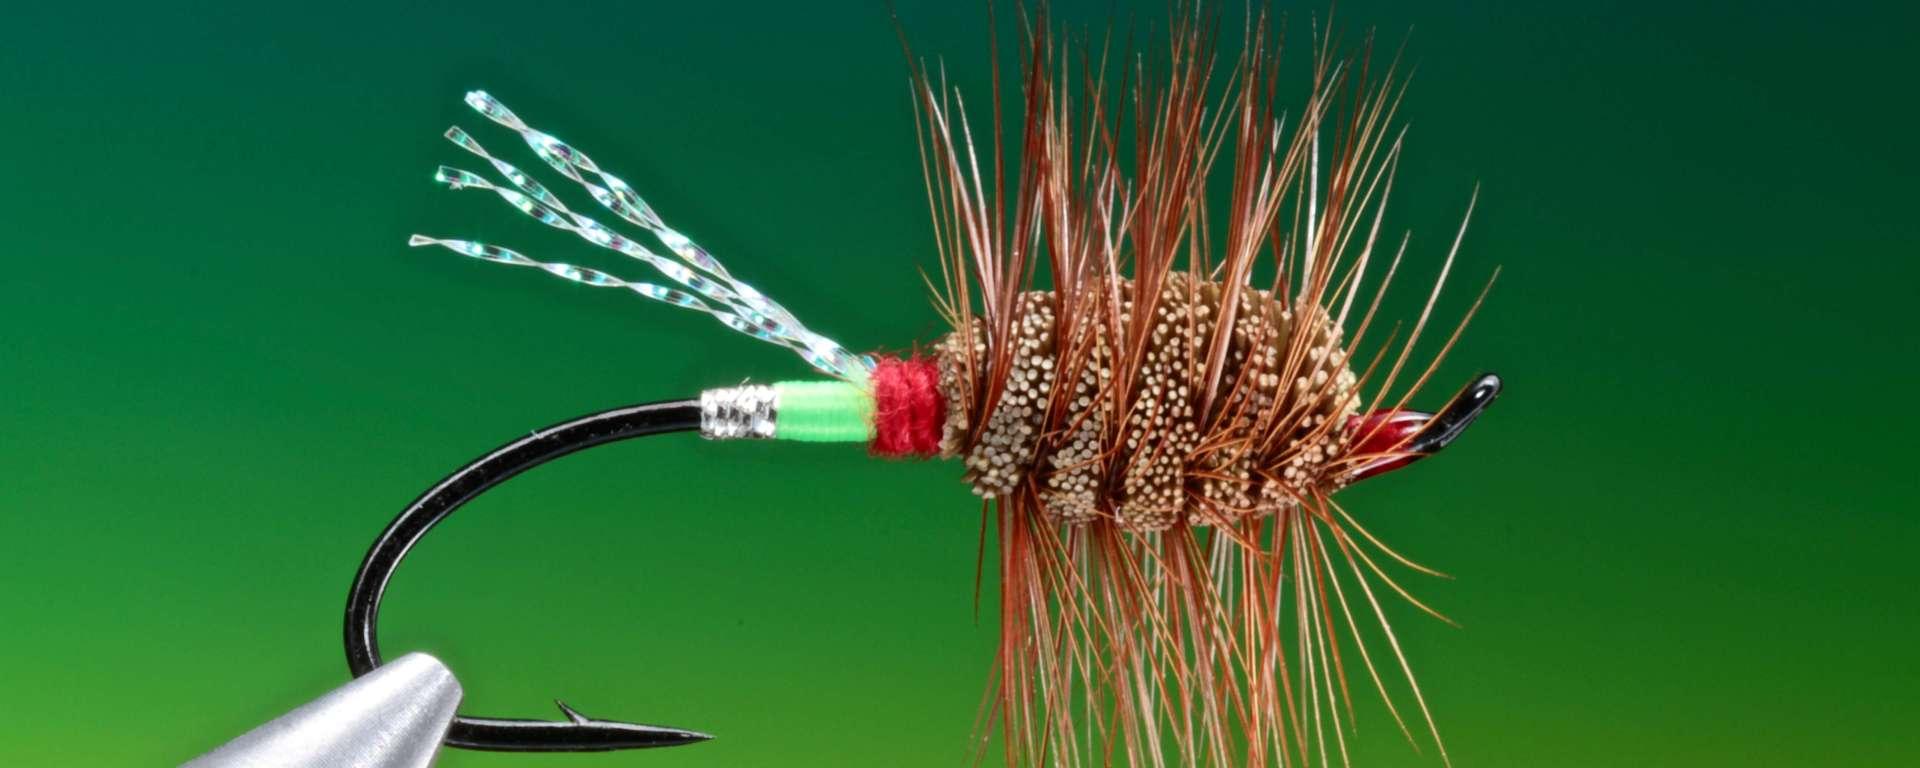 fly tying Green Machine dry fly